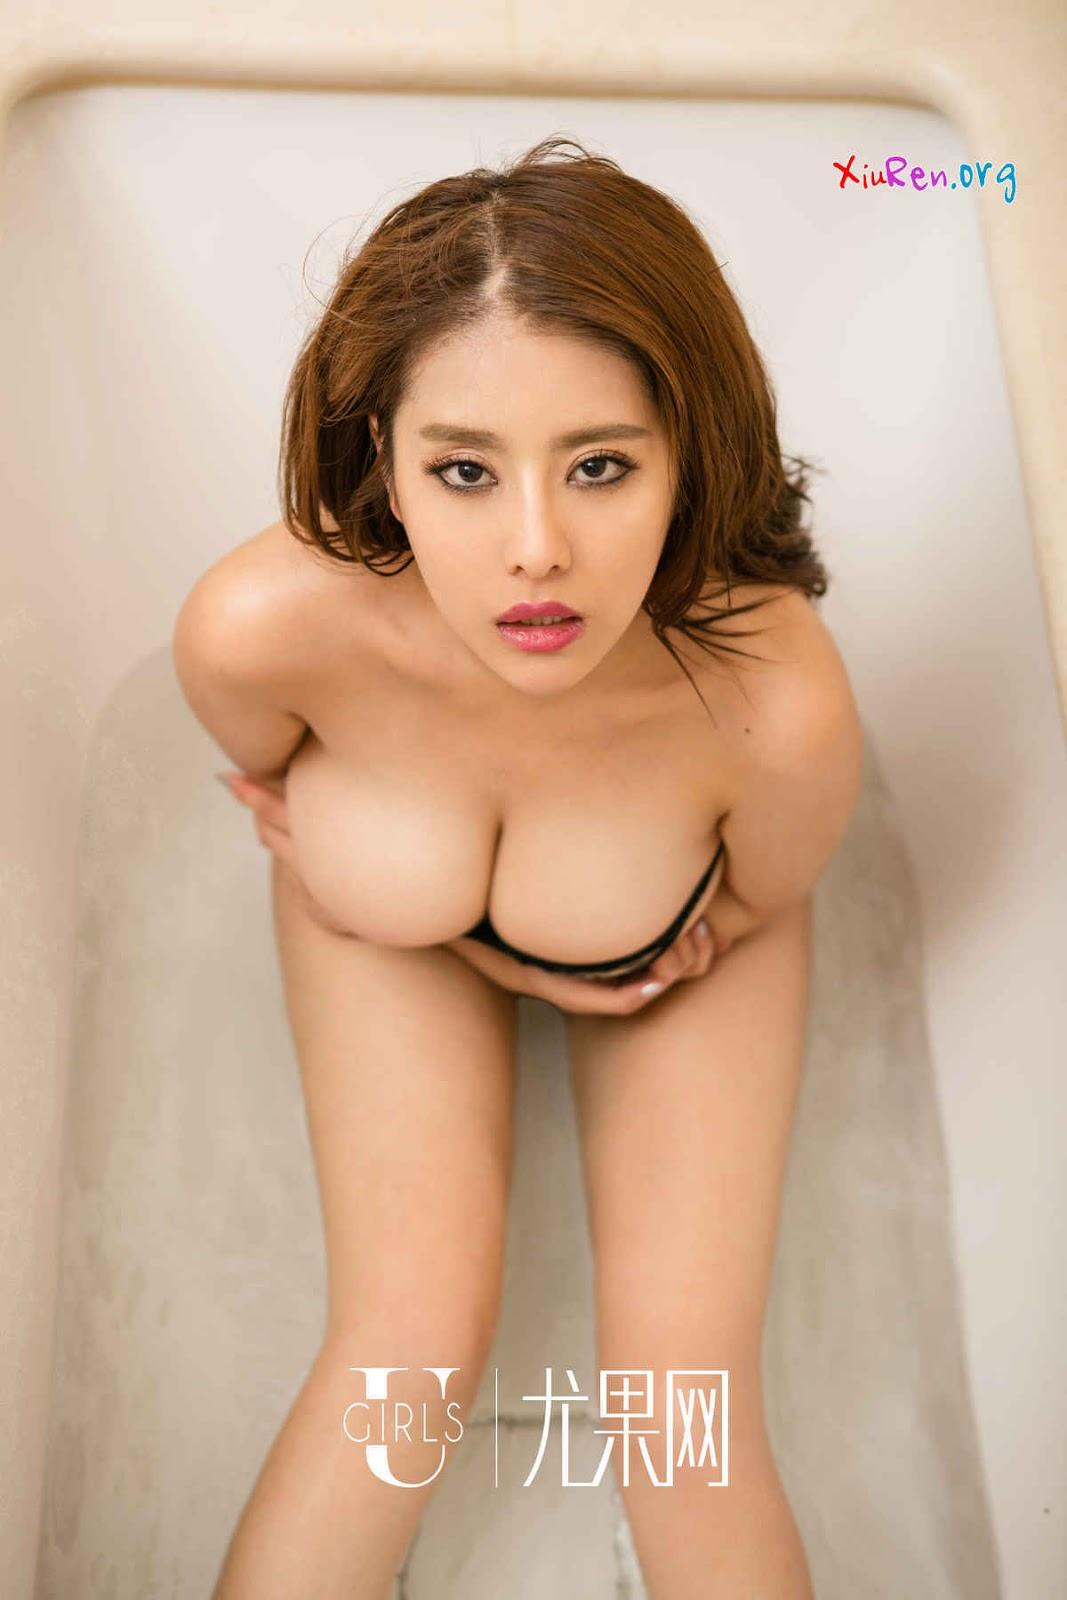 Chinese Boobies Wang Ying 王莹 Ugirls 179 (65 Pict)